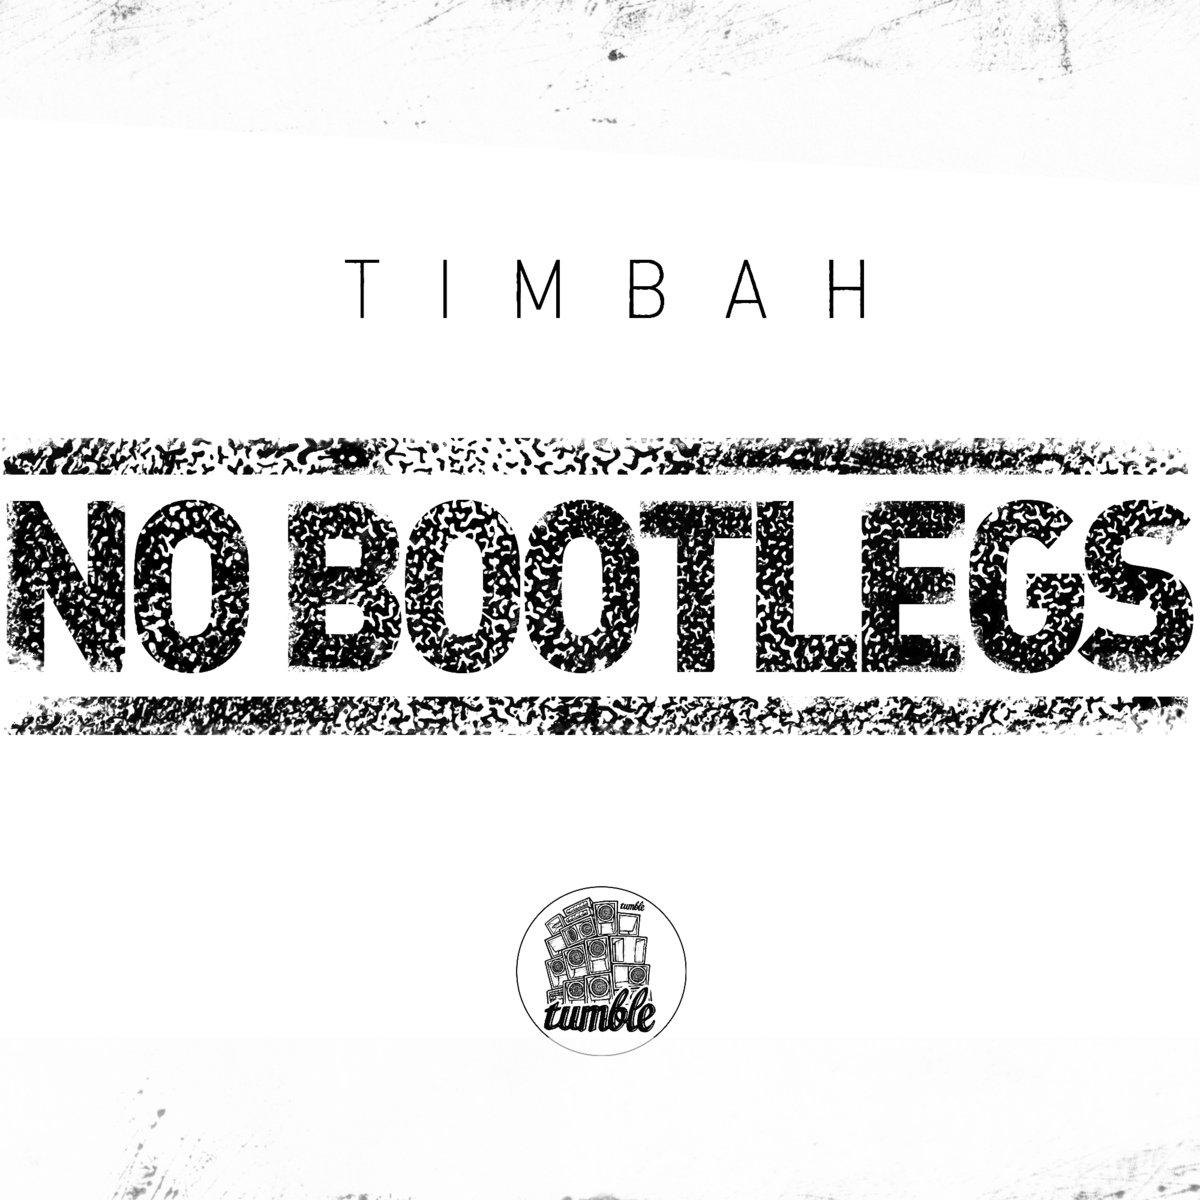 TUM009] Timbah - No Bootlegs EP | Tumble Audio